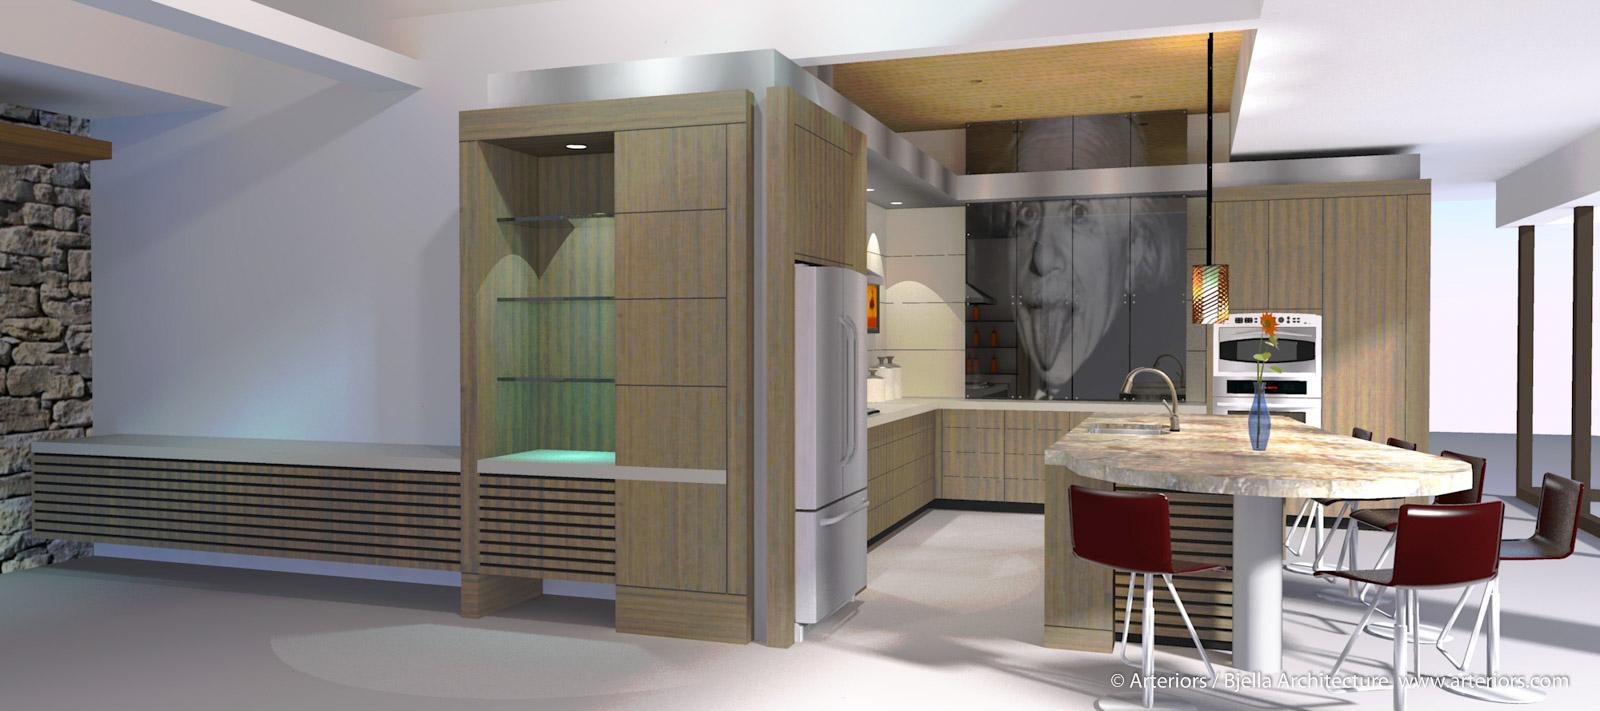 Modern Marco Island Florida Kitchen by Arteriors Architecture